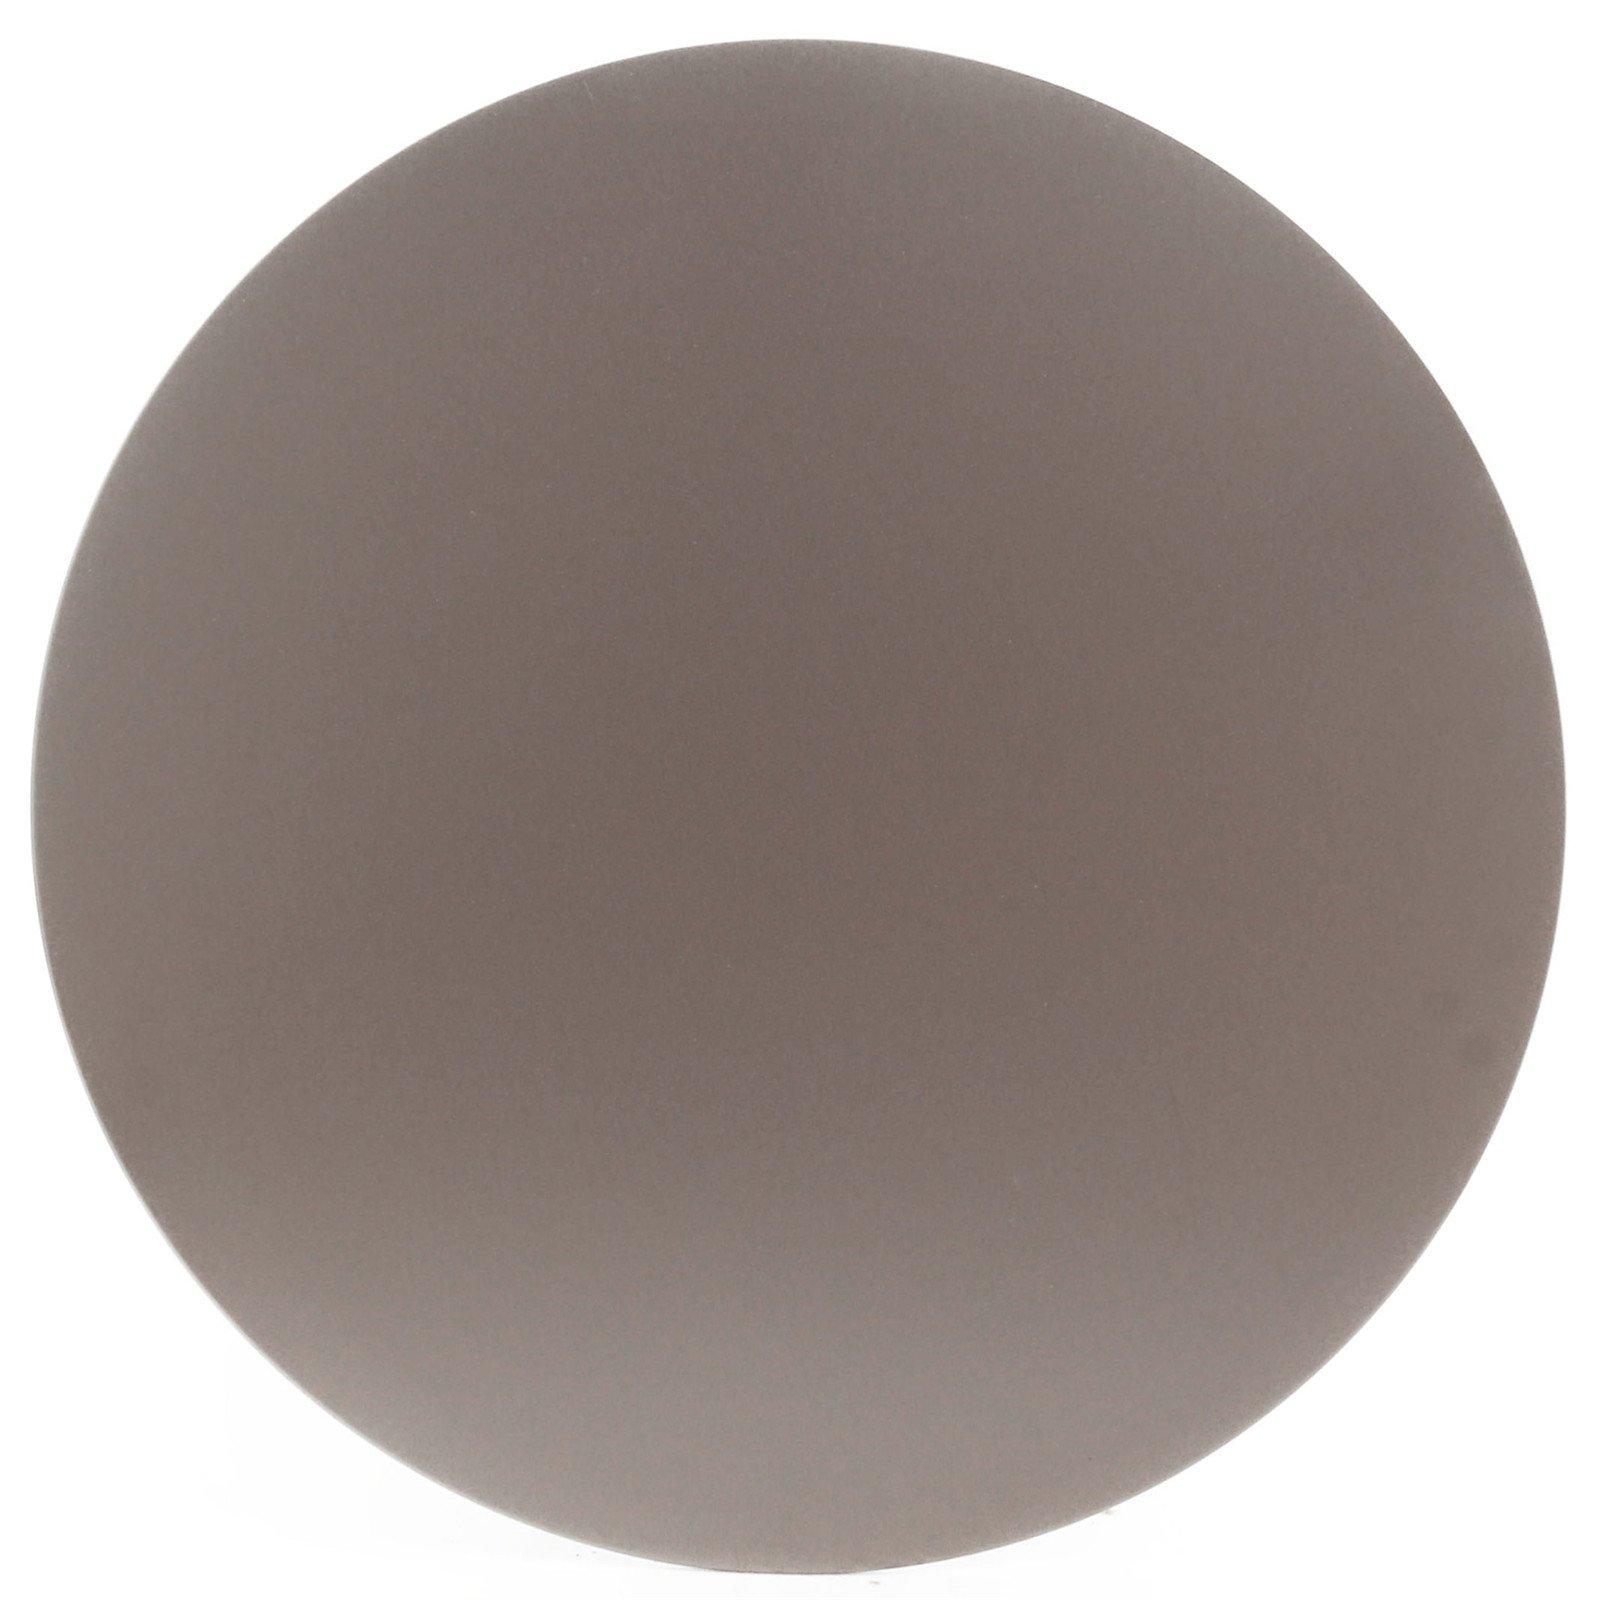 18 inch Diamond Fine Grinding Wheel 800 Grit Coated No Hole Flat Lap Disc